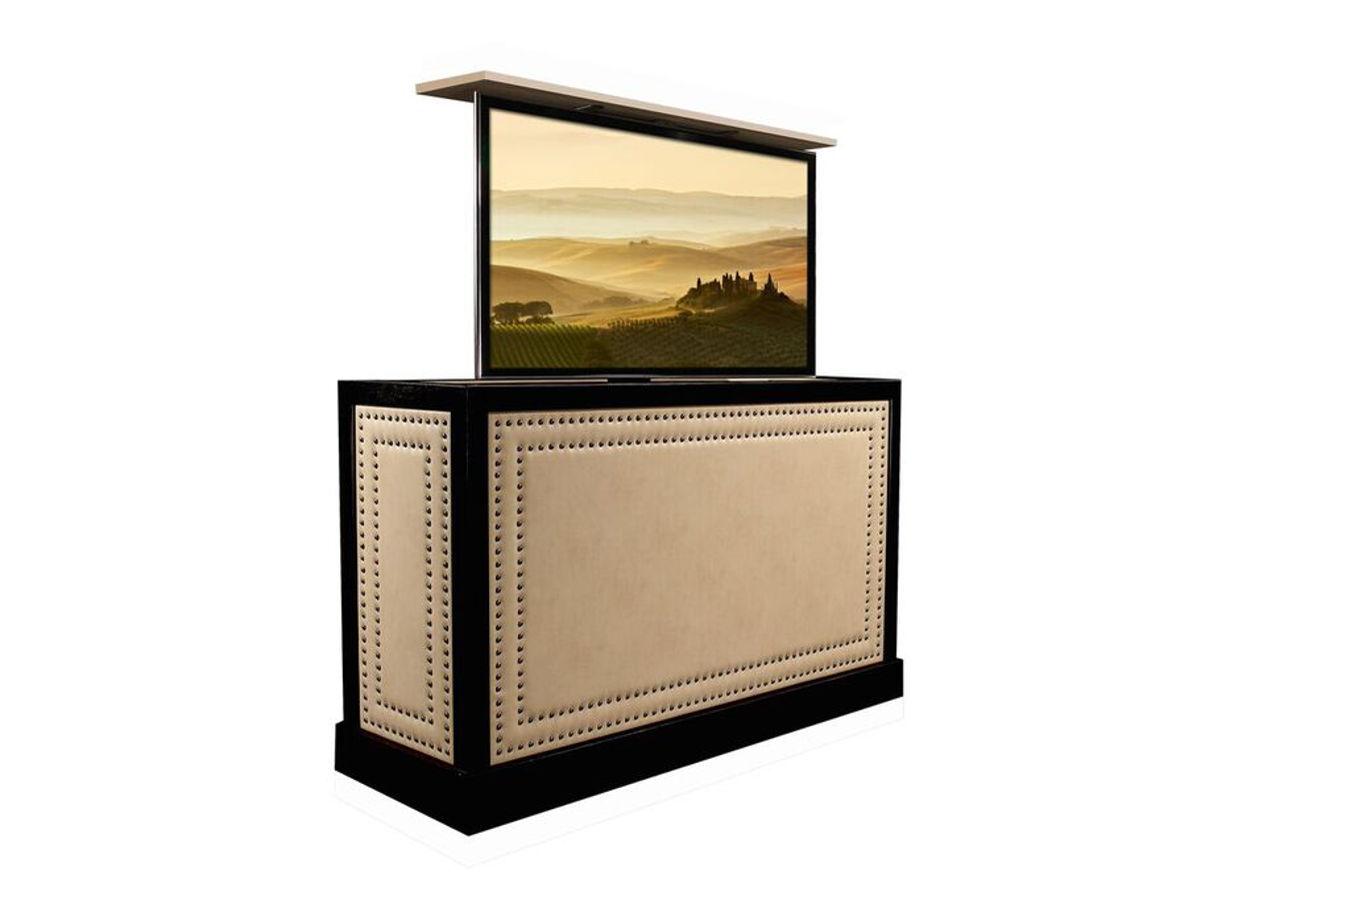 custom designed flat screen tv lift furniture. Black Bedroom Furniture Sets. Home Design Ideas